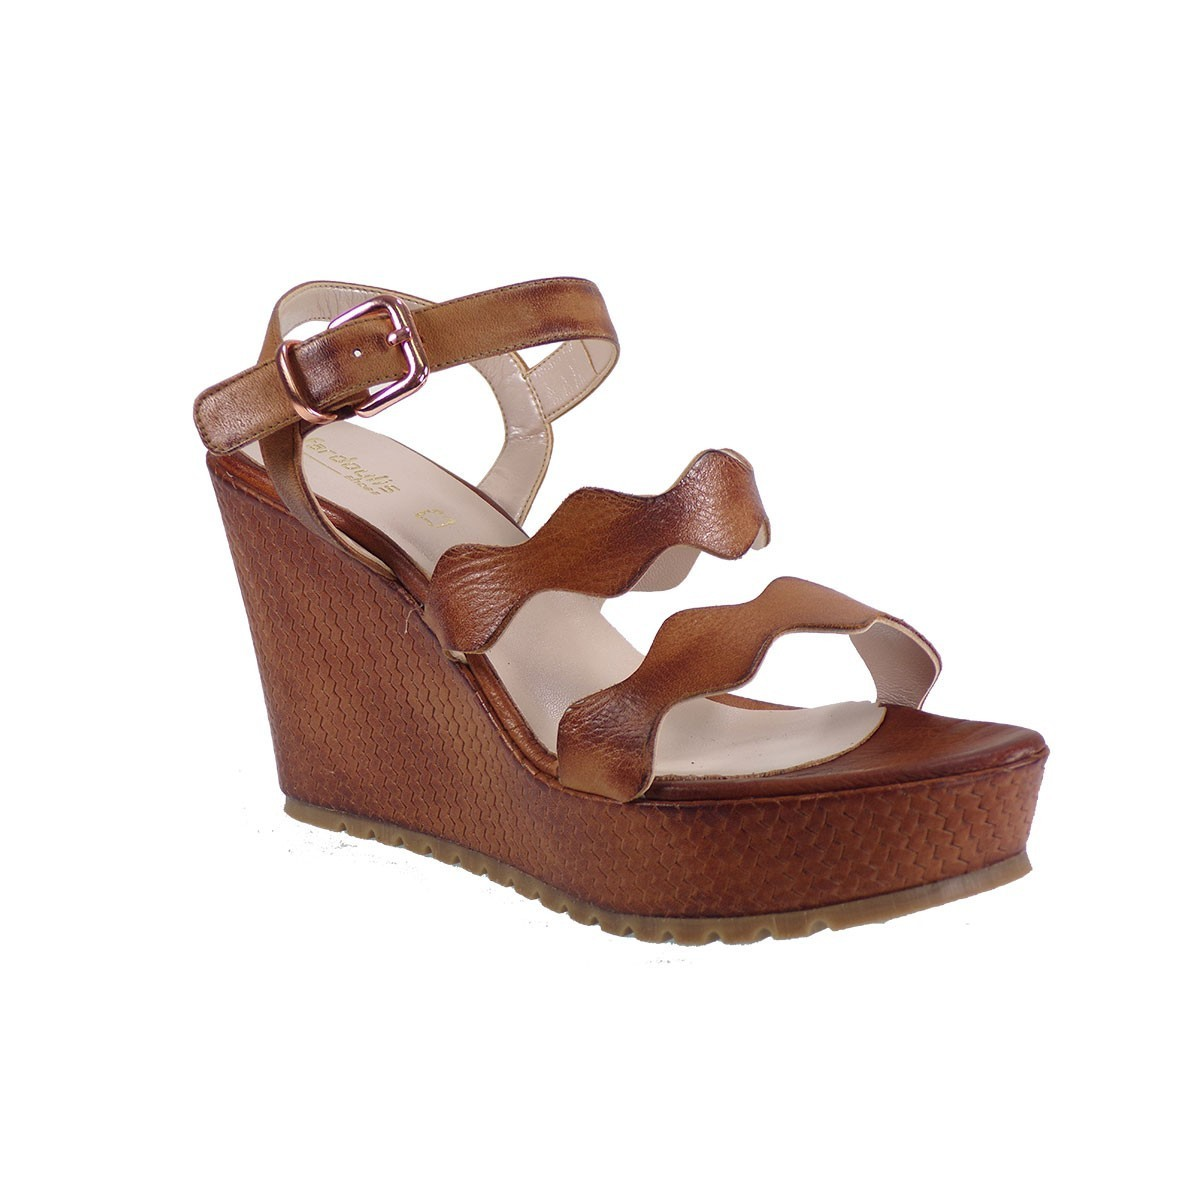 b285eda93b9 Fardoulis shoes Γυναικείες Πλατφόρμες Πέδιλα 26207 Ταμπά Δέρμα